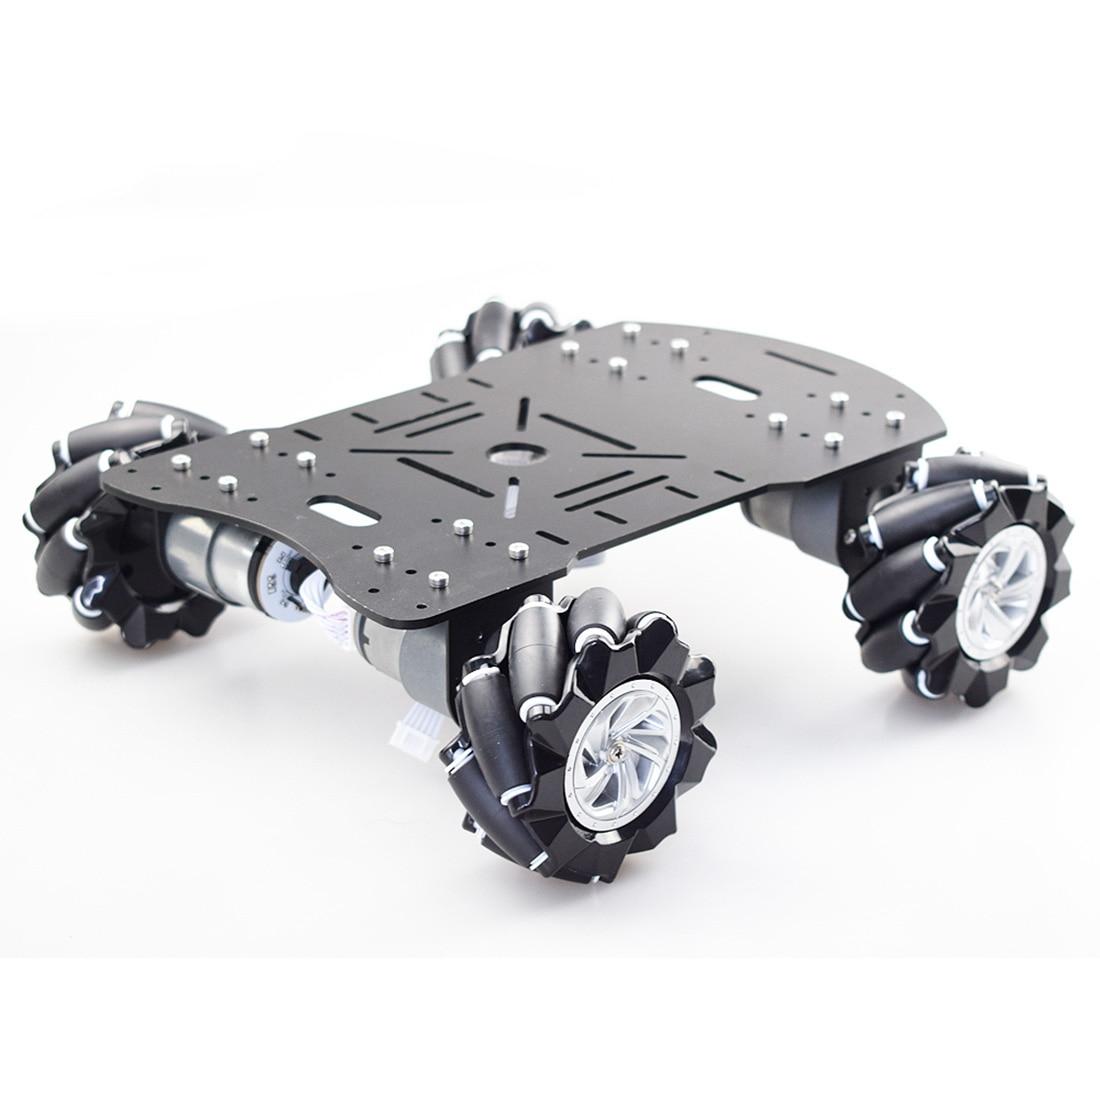 80mm Mecanum Acrylic Platform Kit DIY Omni-Directional Mecanum Wheel Robot Car Without Electronic Control - Black